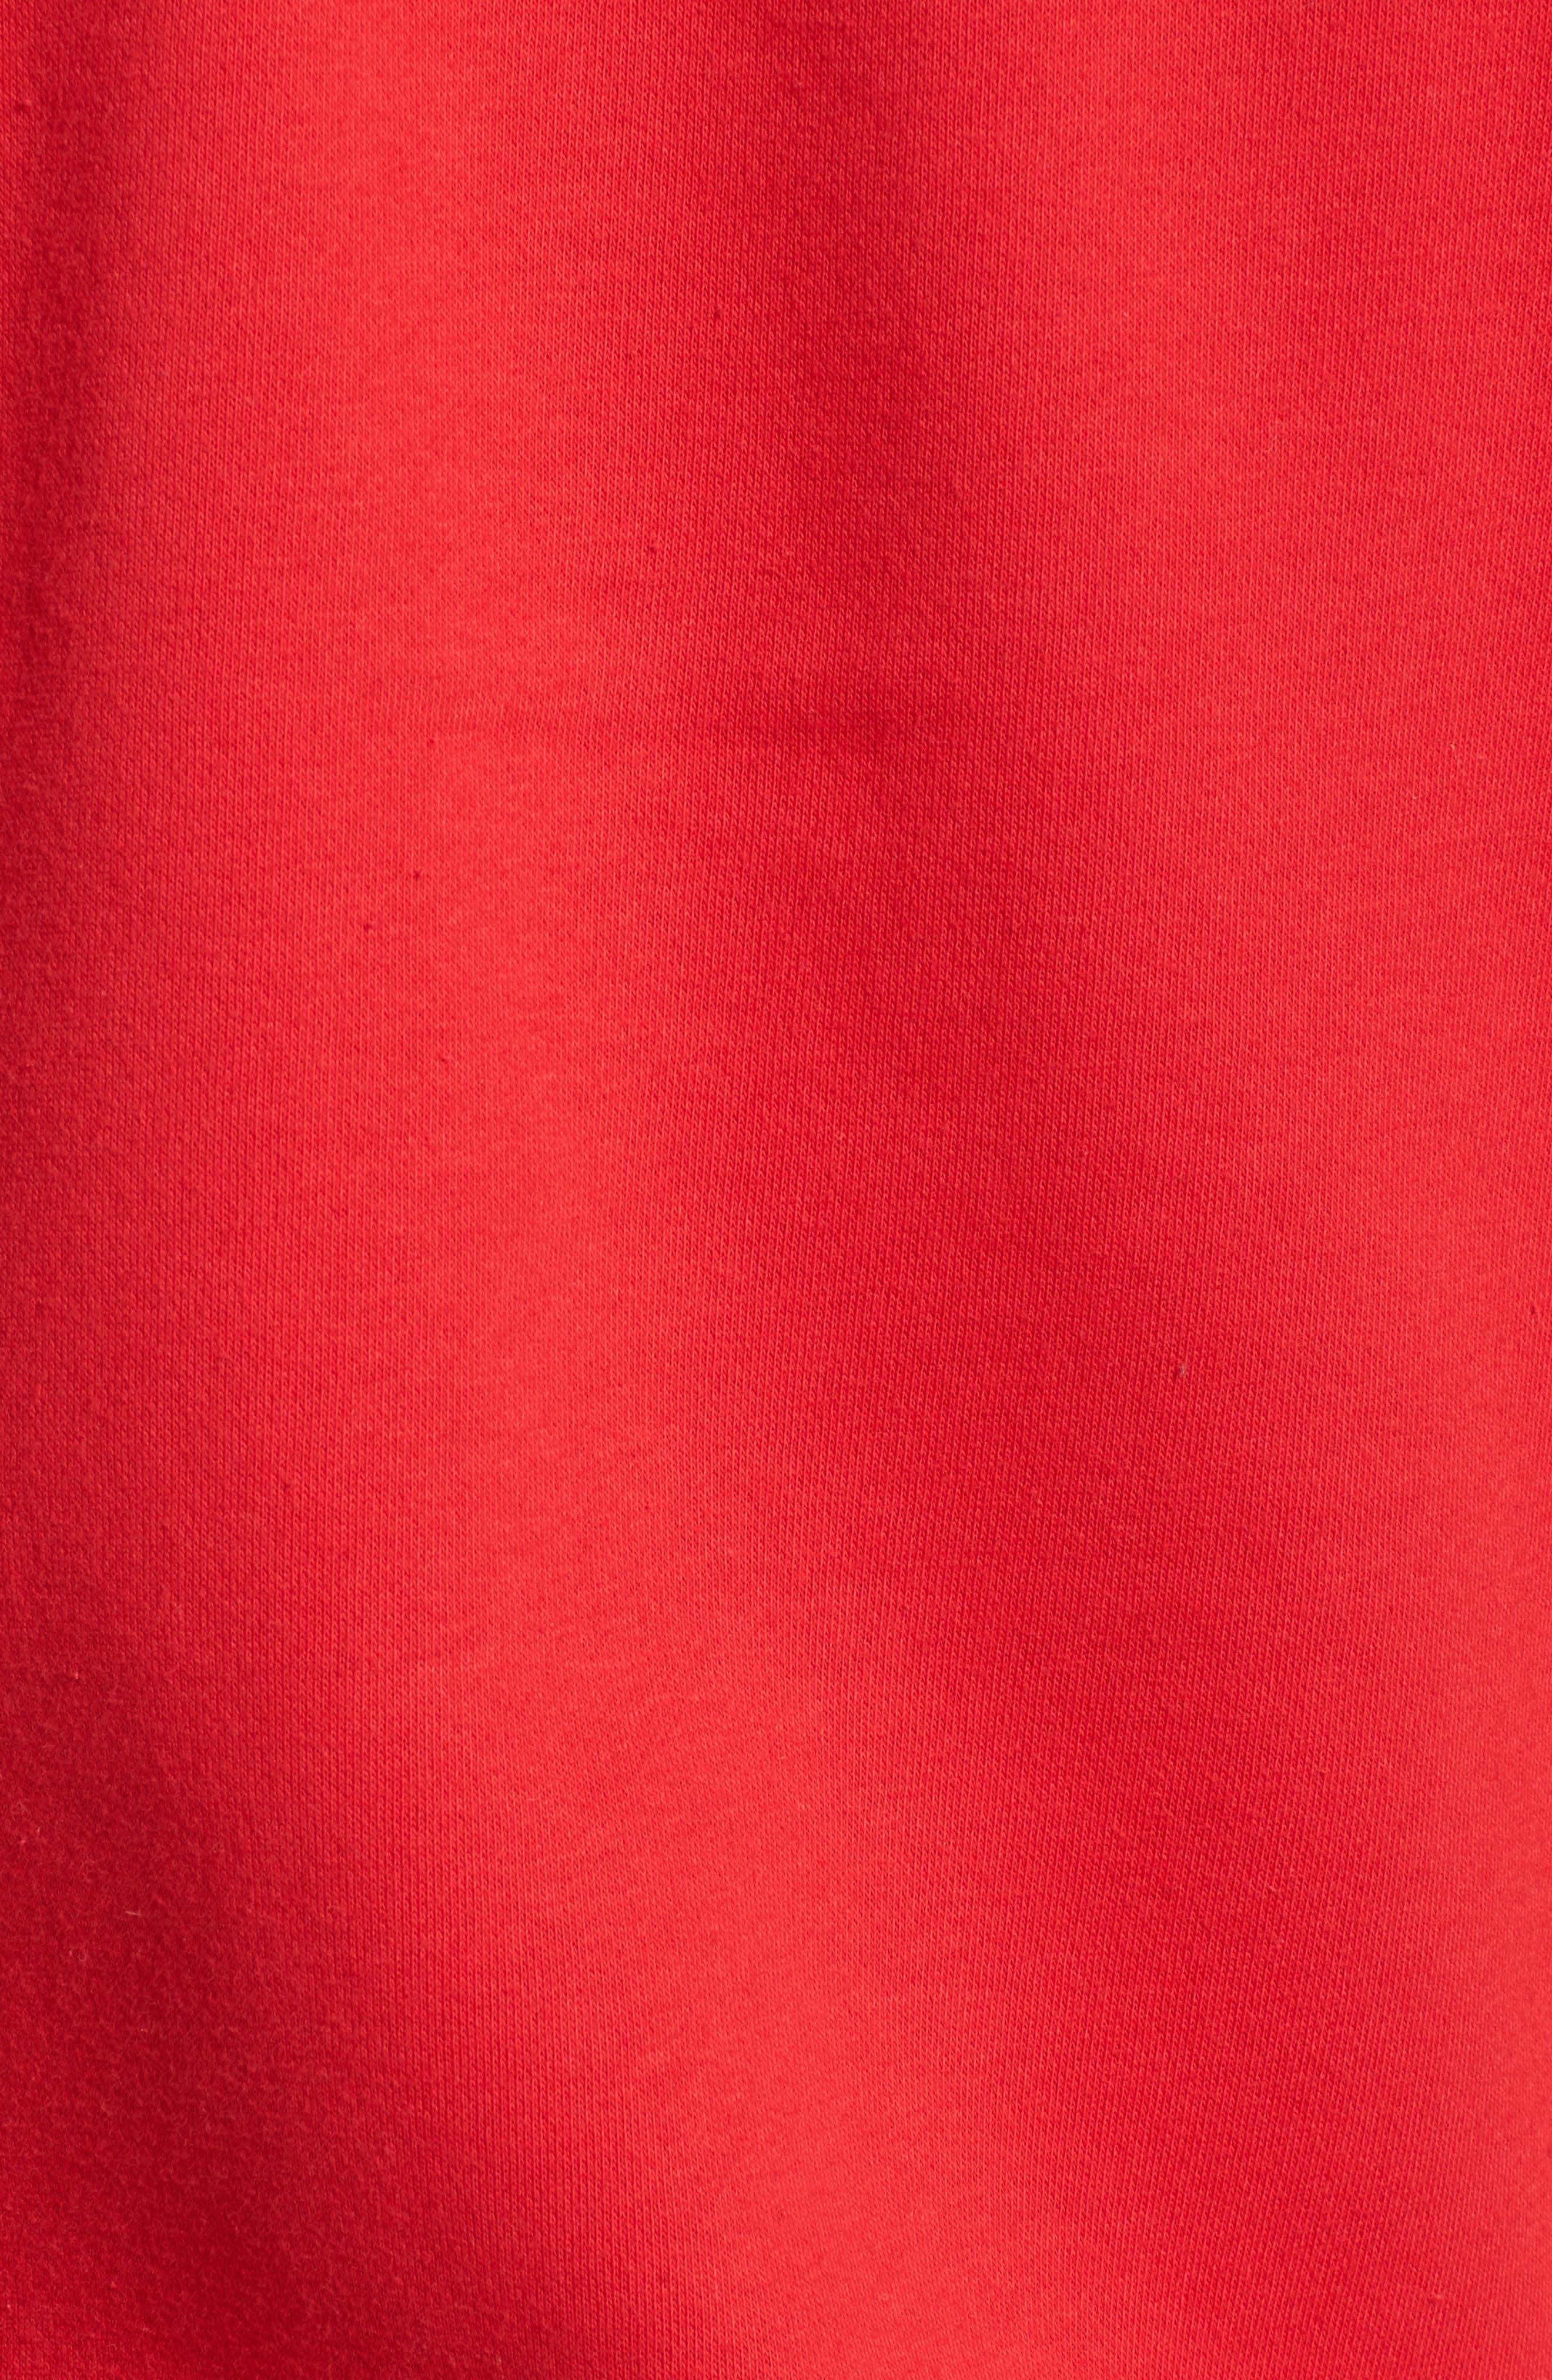 Rivington II Hooded Jacket,                             Alternate thumbnail 5, color,                             Red